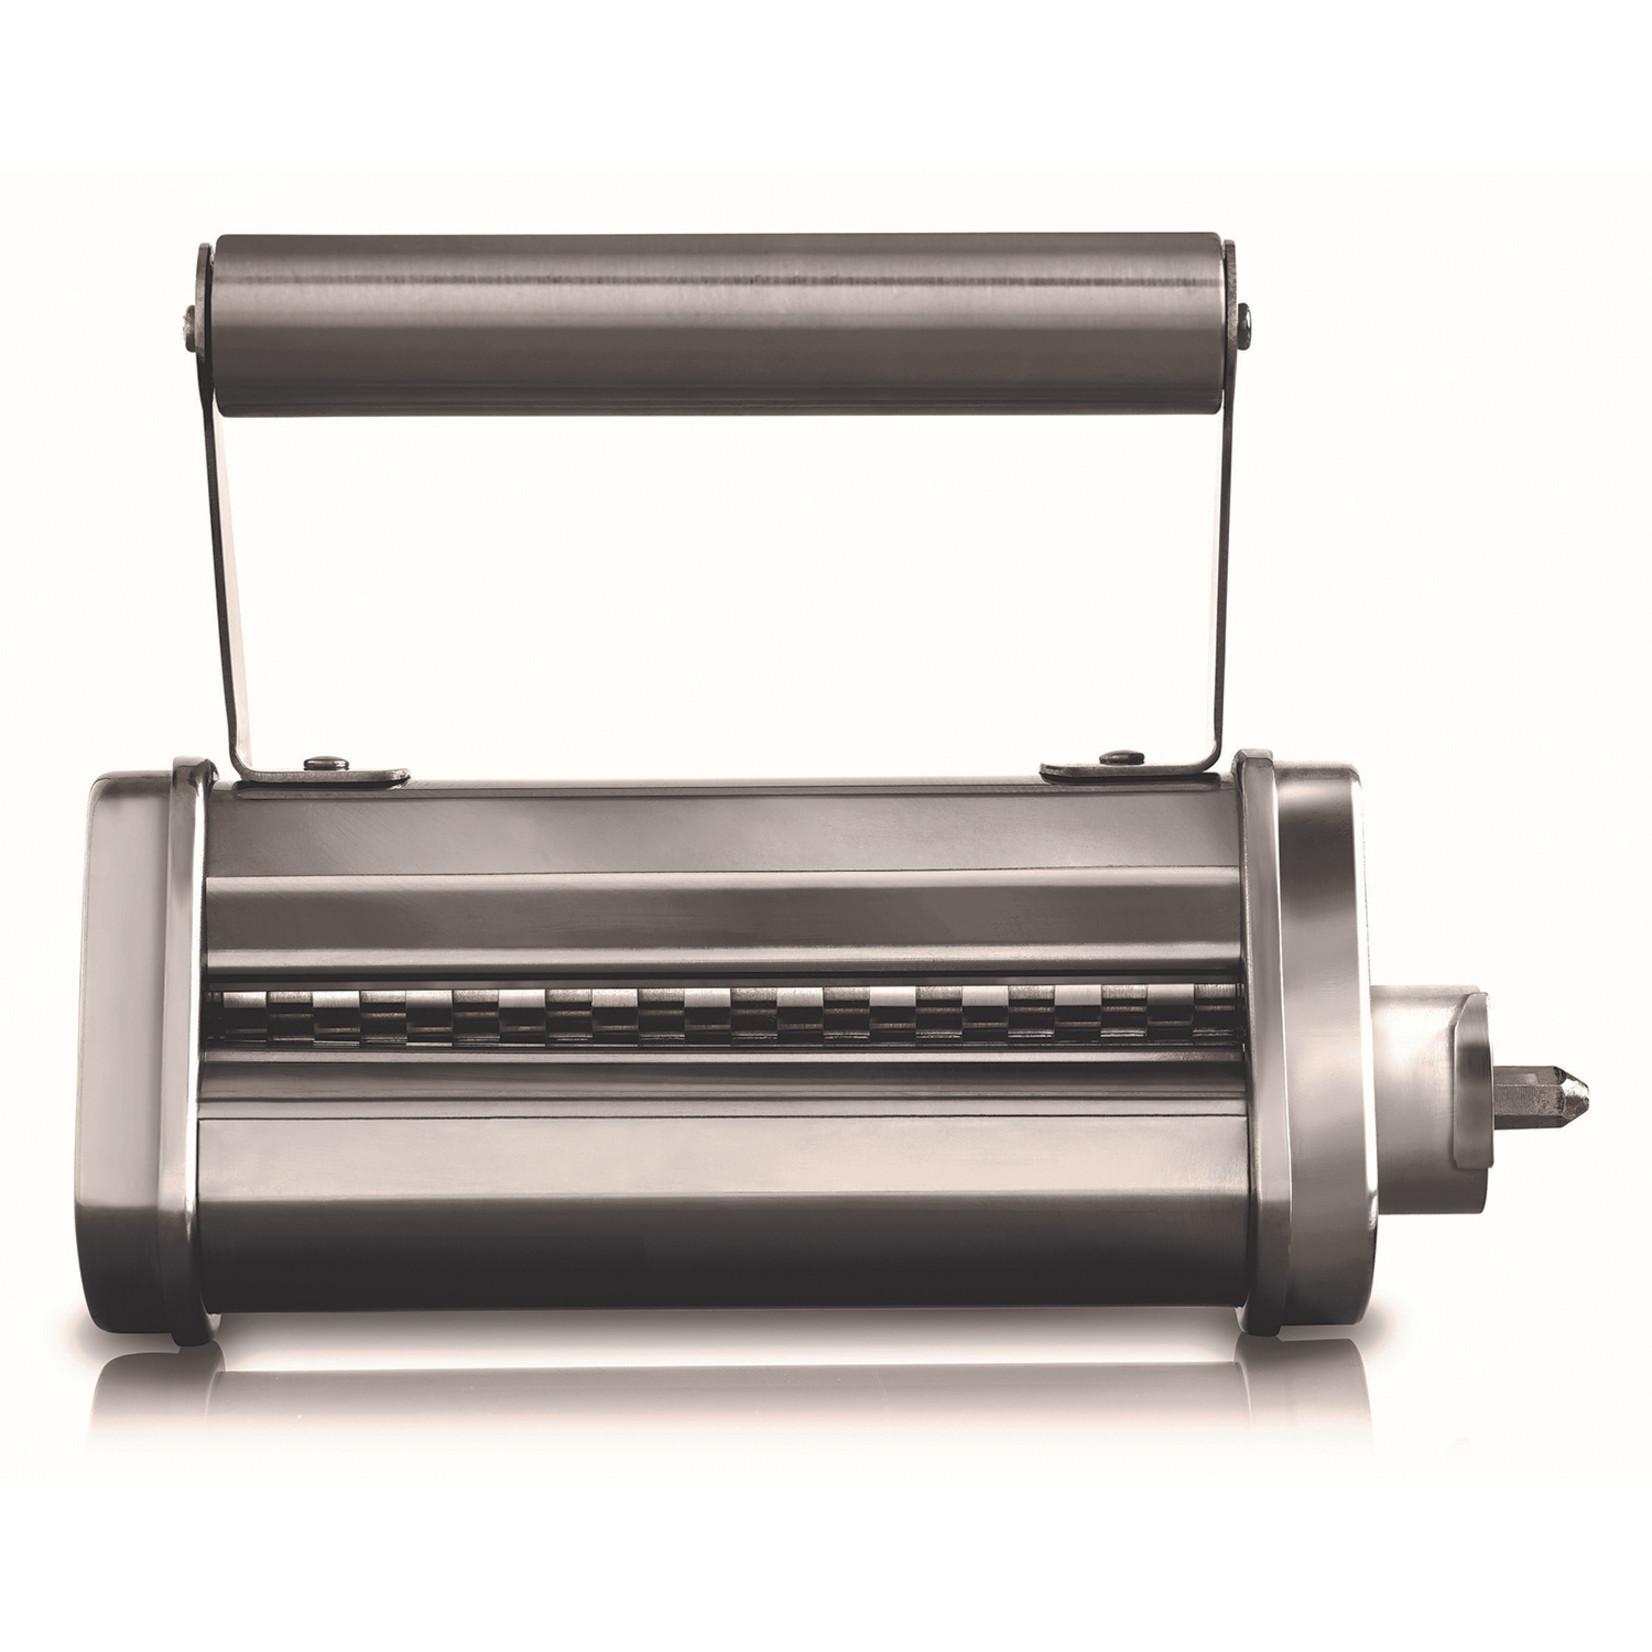 Espressions Espressions EP9550 keukenmachine MixMaster Combo